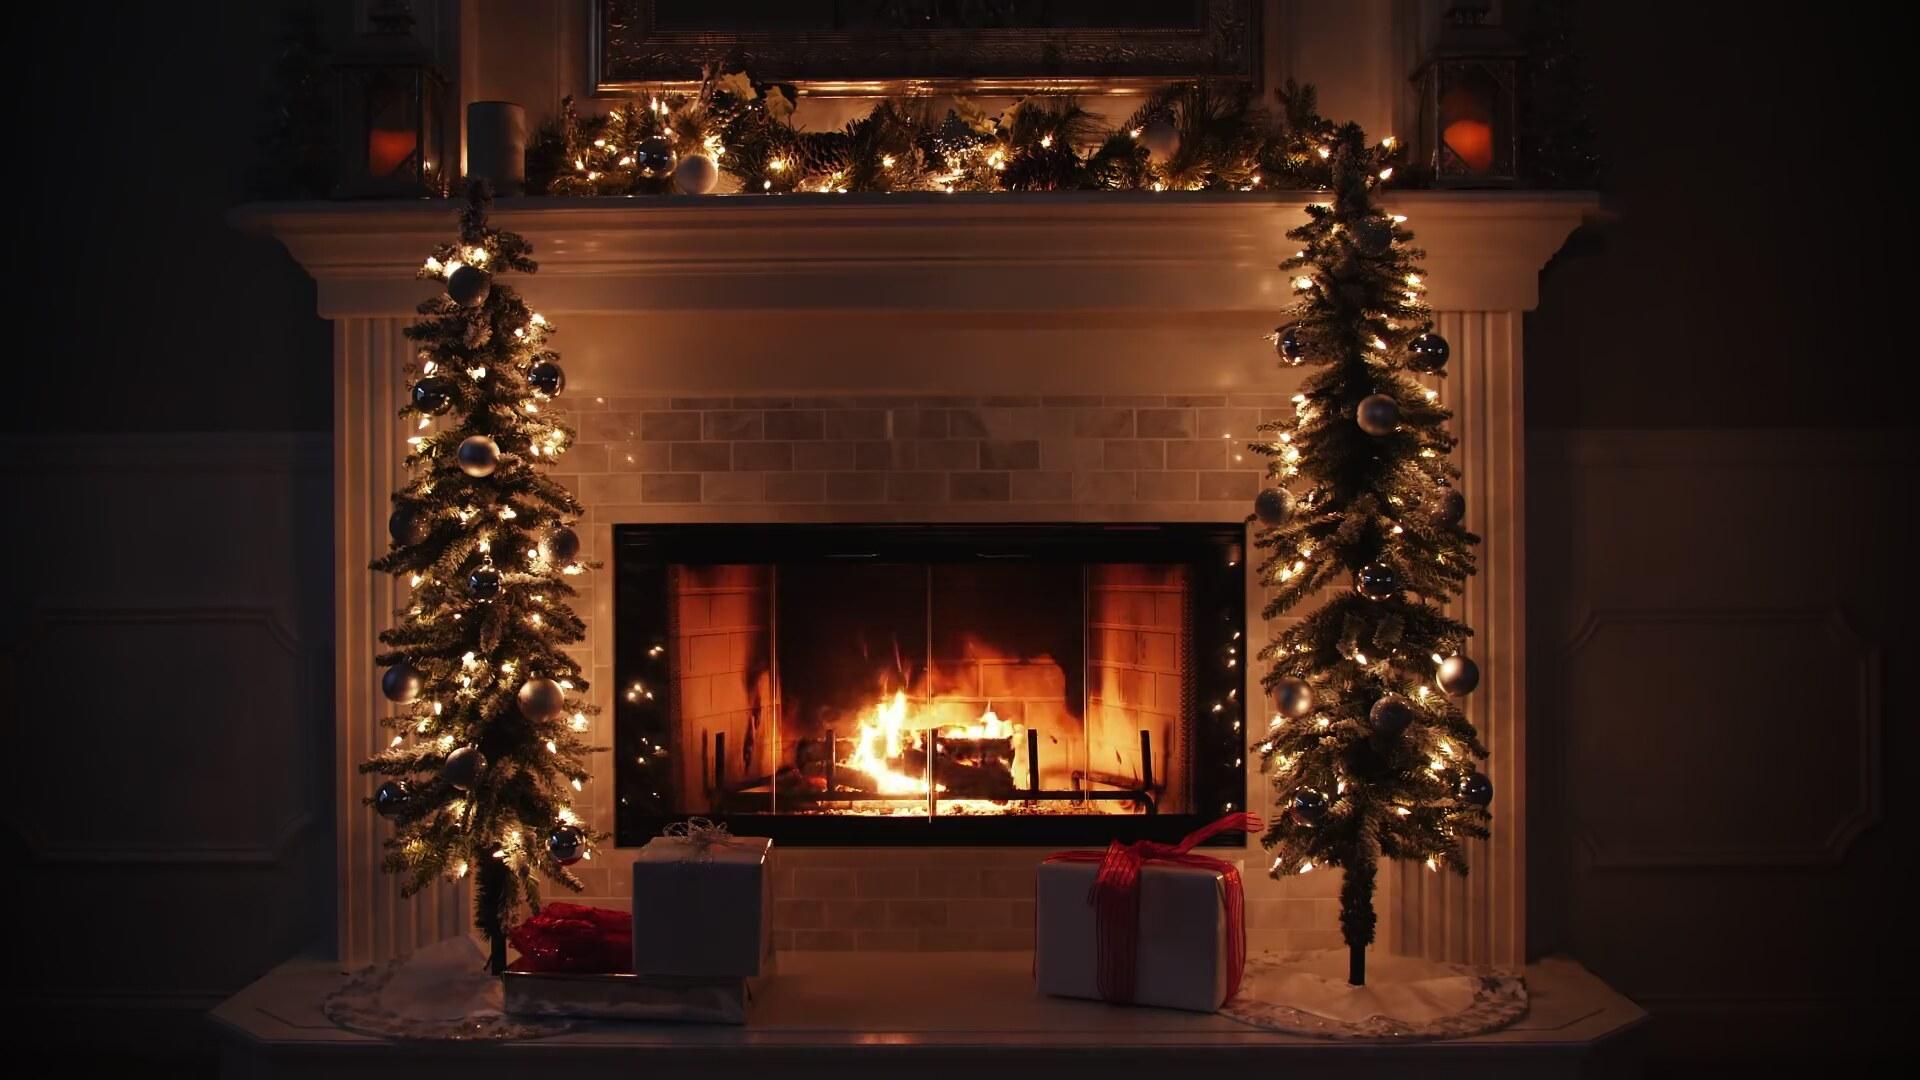 Pentatonix - Grown Up Christmas List (ft. Kelly Clarkson) | İzlesene.com